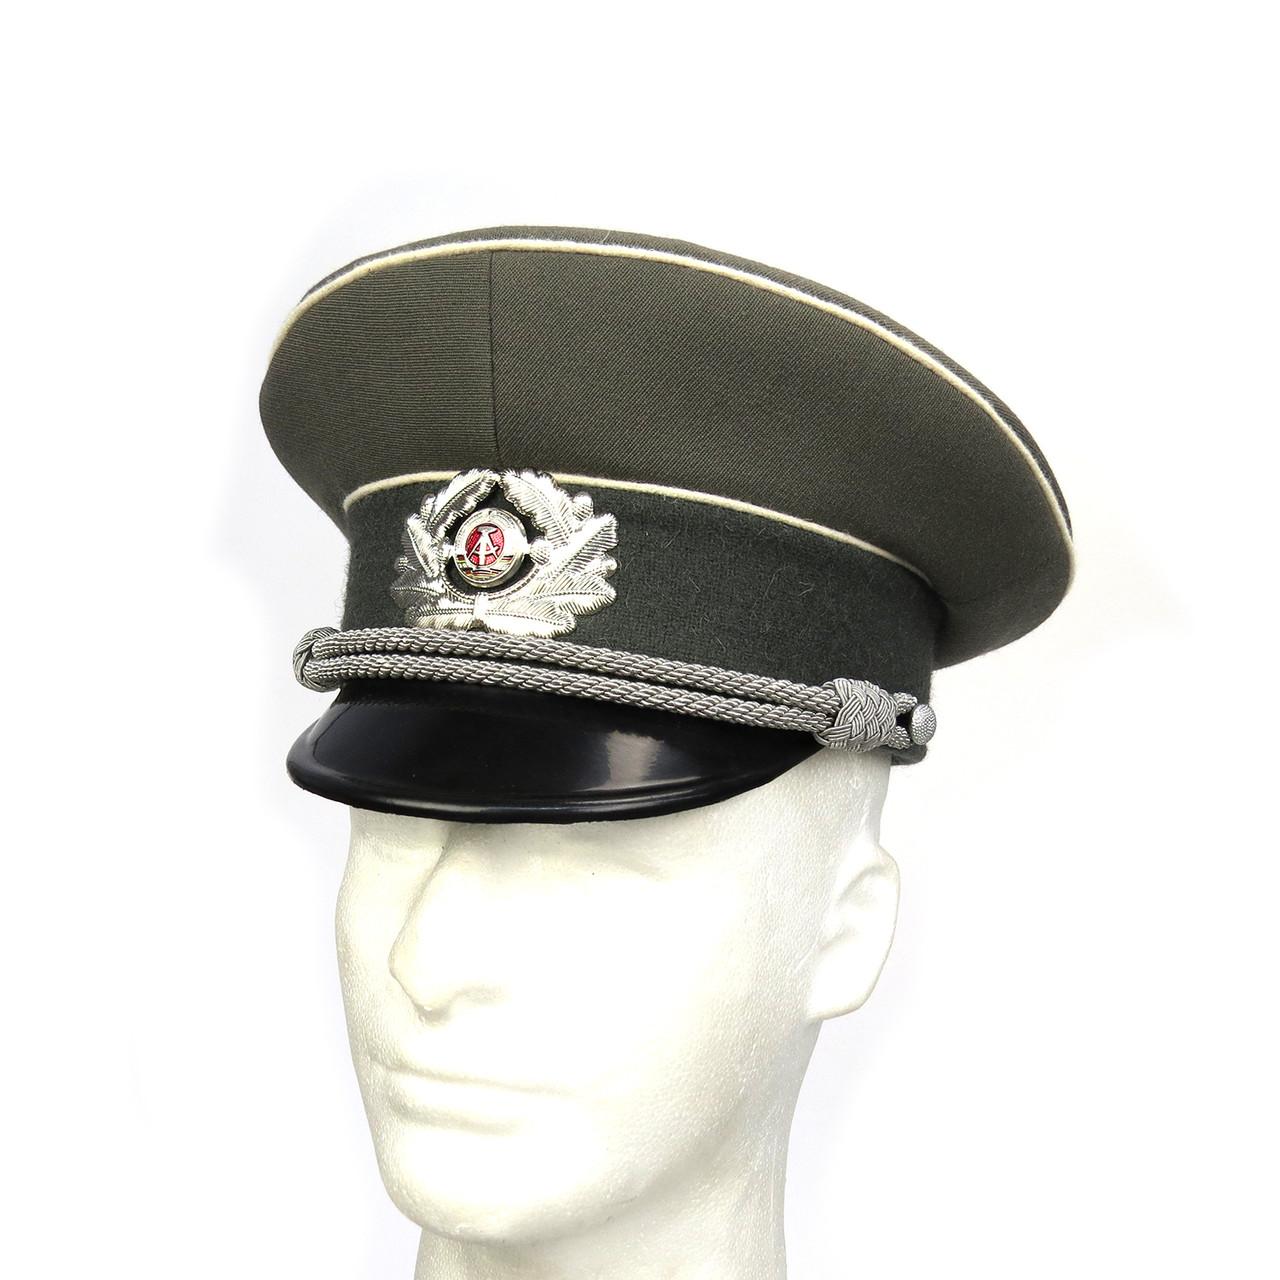 Repro DDR National Volks Armee Visor Cap